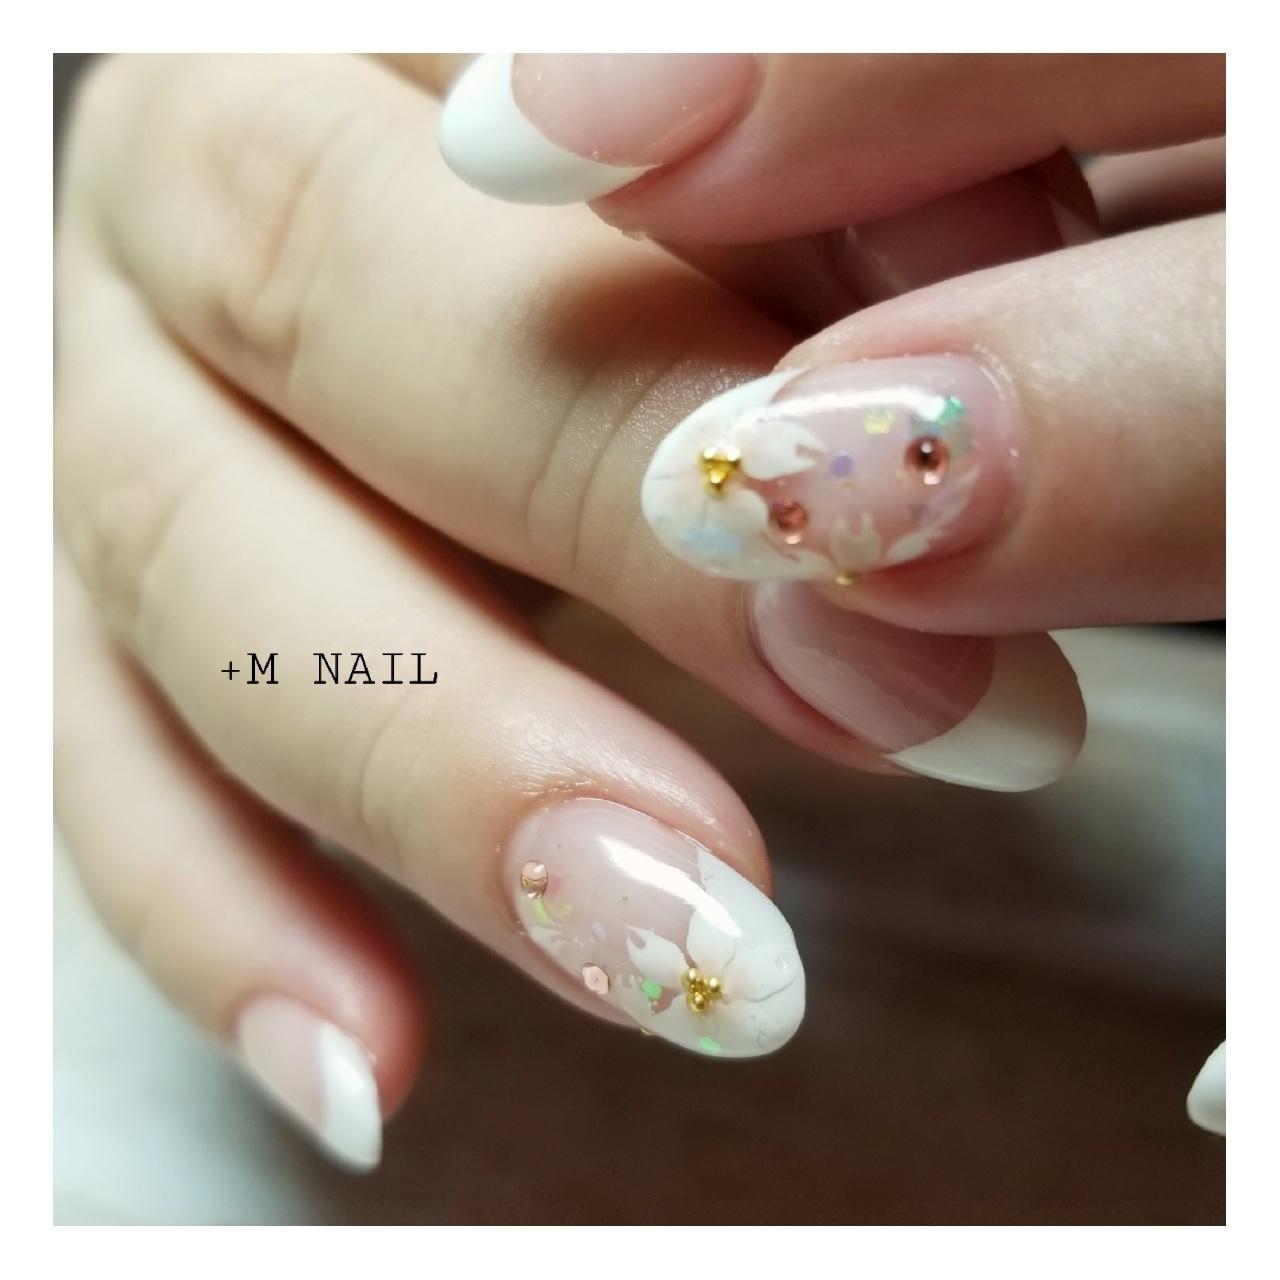 #nails #ジェル #ジェルネイル #ネイル #ネイルサロン #ネイルデザイン #ハンド #パーティー #上品ネイル #大人ネイル #大人可愛い #桜ネイル#フレンチネイル#フラワーネイル